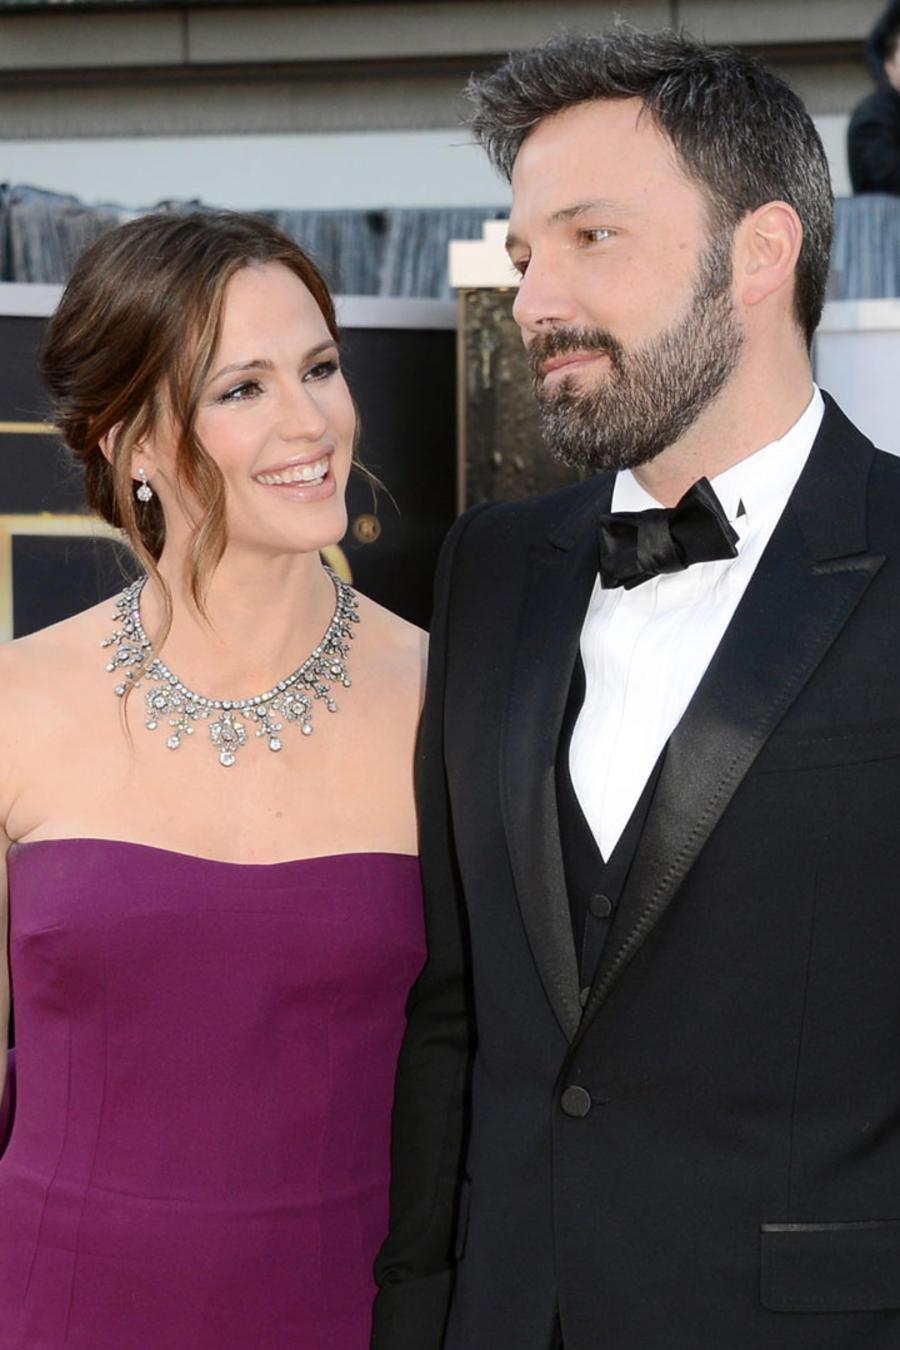 Jennifer Garner y Ben Affleck en los Premios Oscar 2013